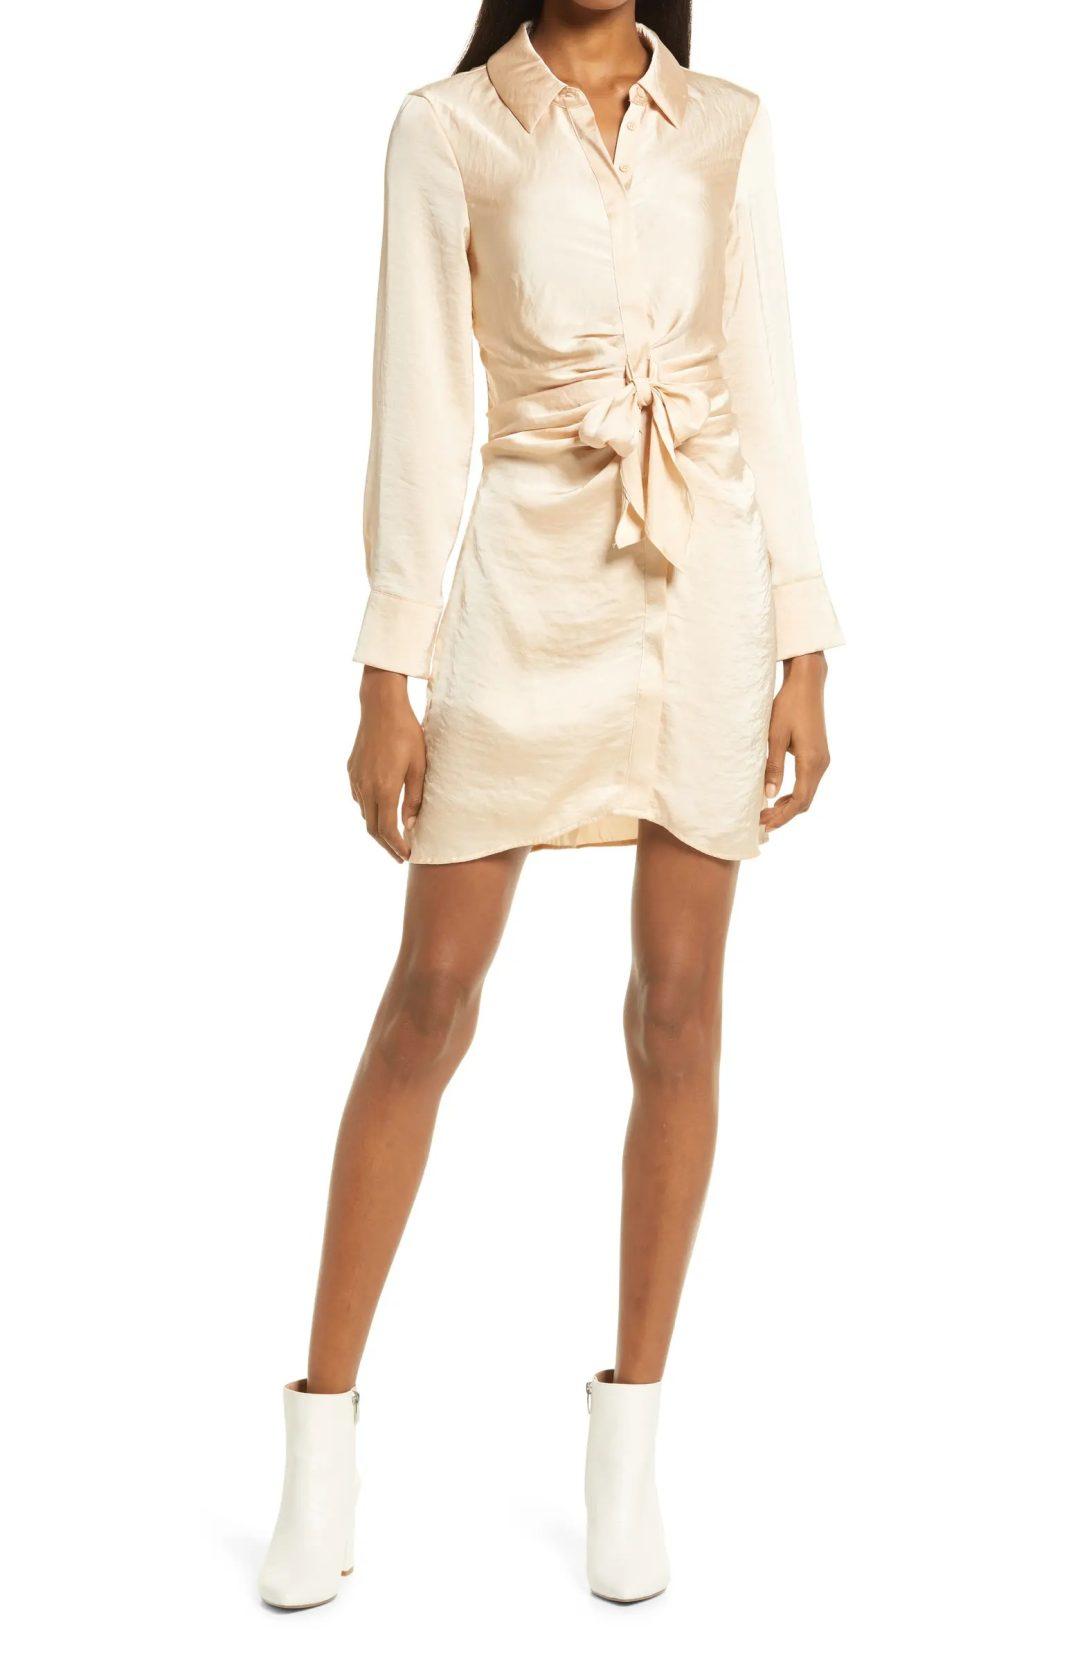 Cream satin wrap dress